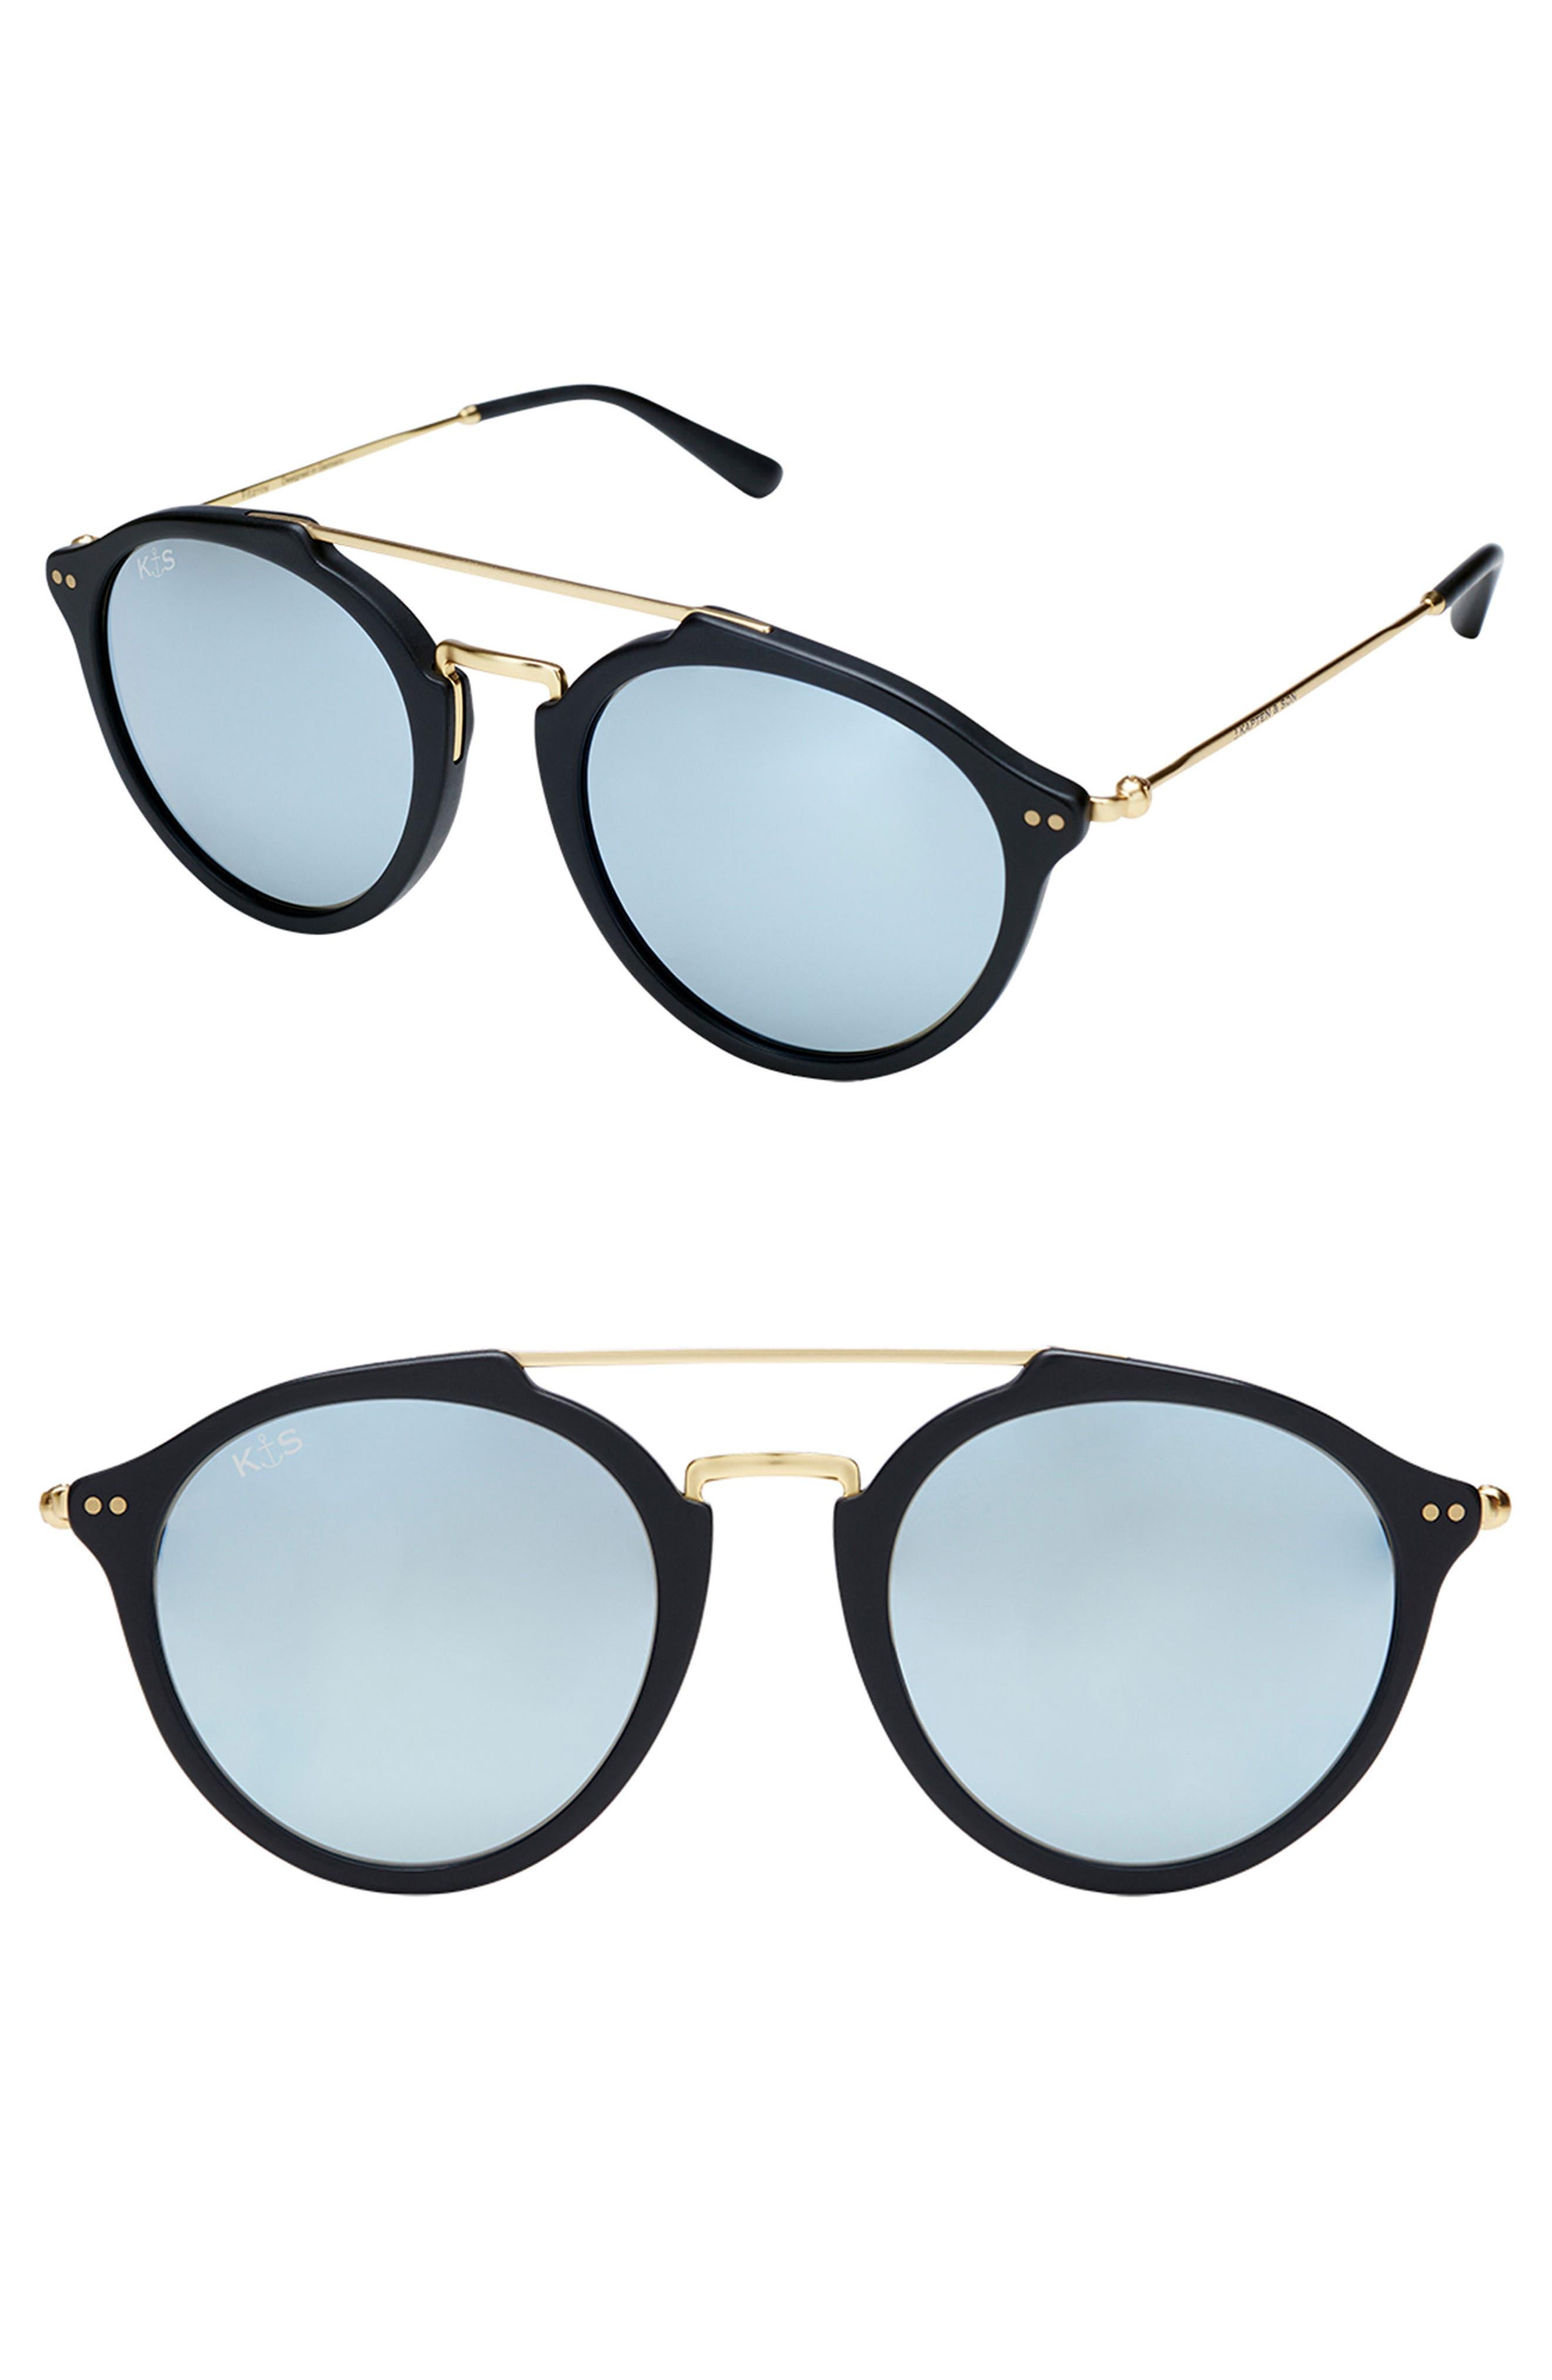 Fitzroy 48mm Sunglasses,                             Main thumbnail 1, color,                             BLACK/ BLUE